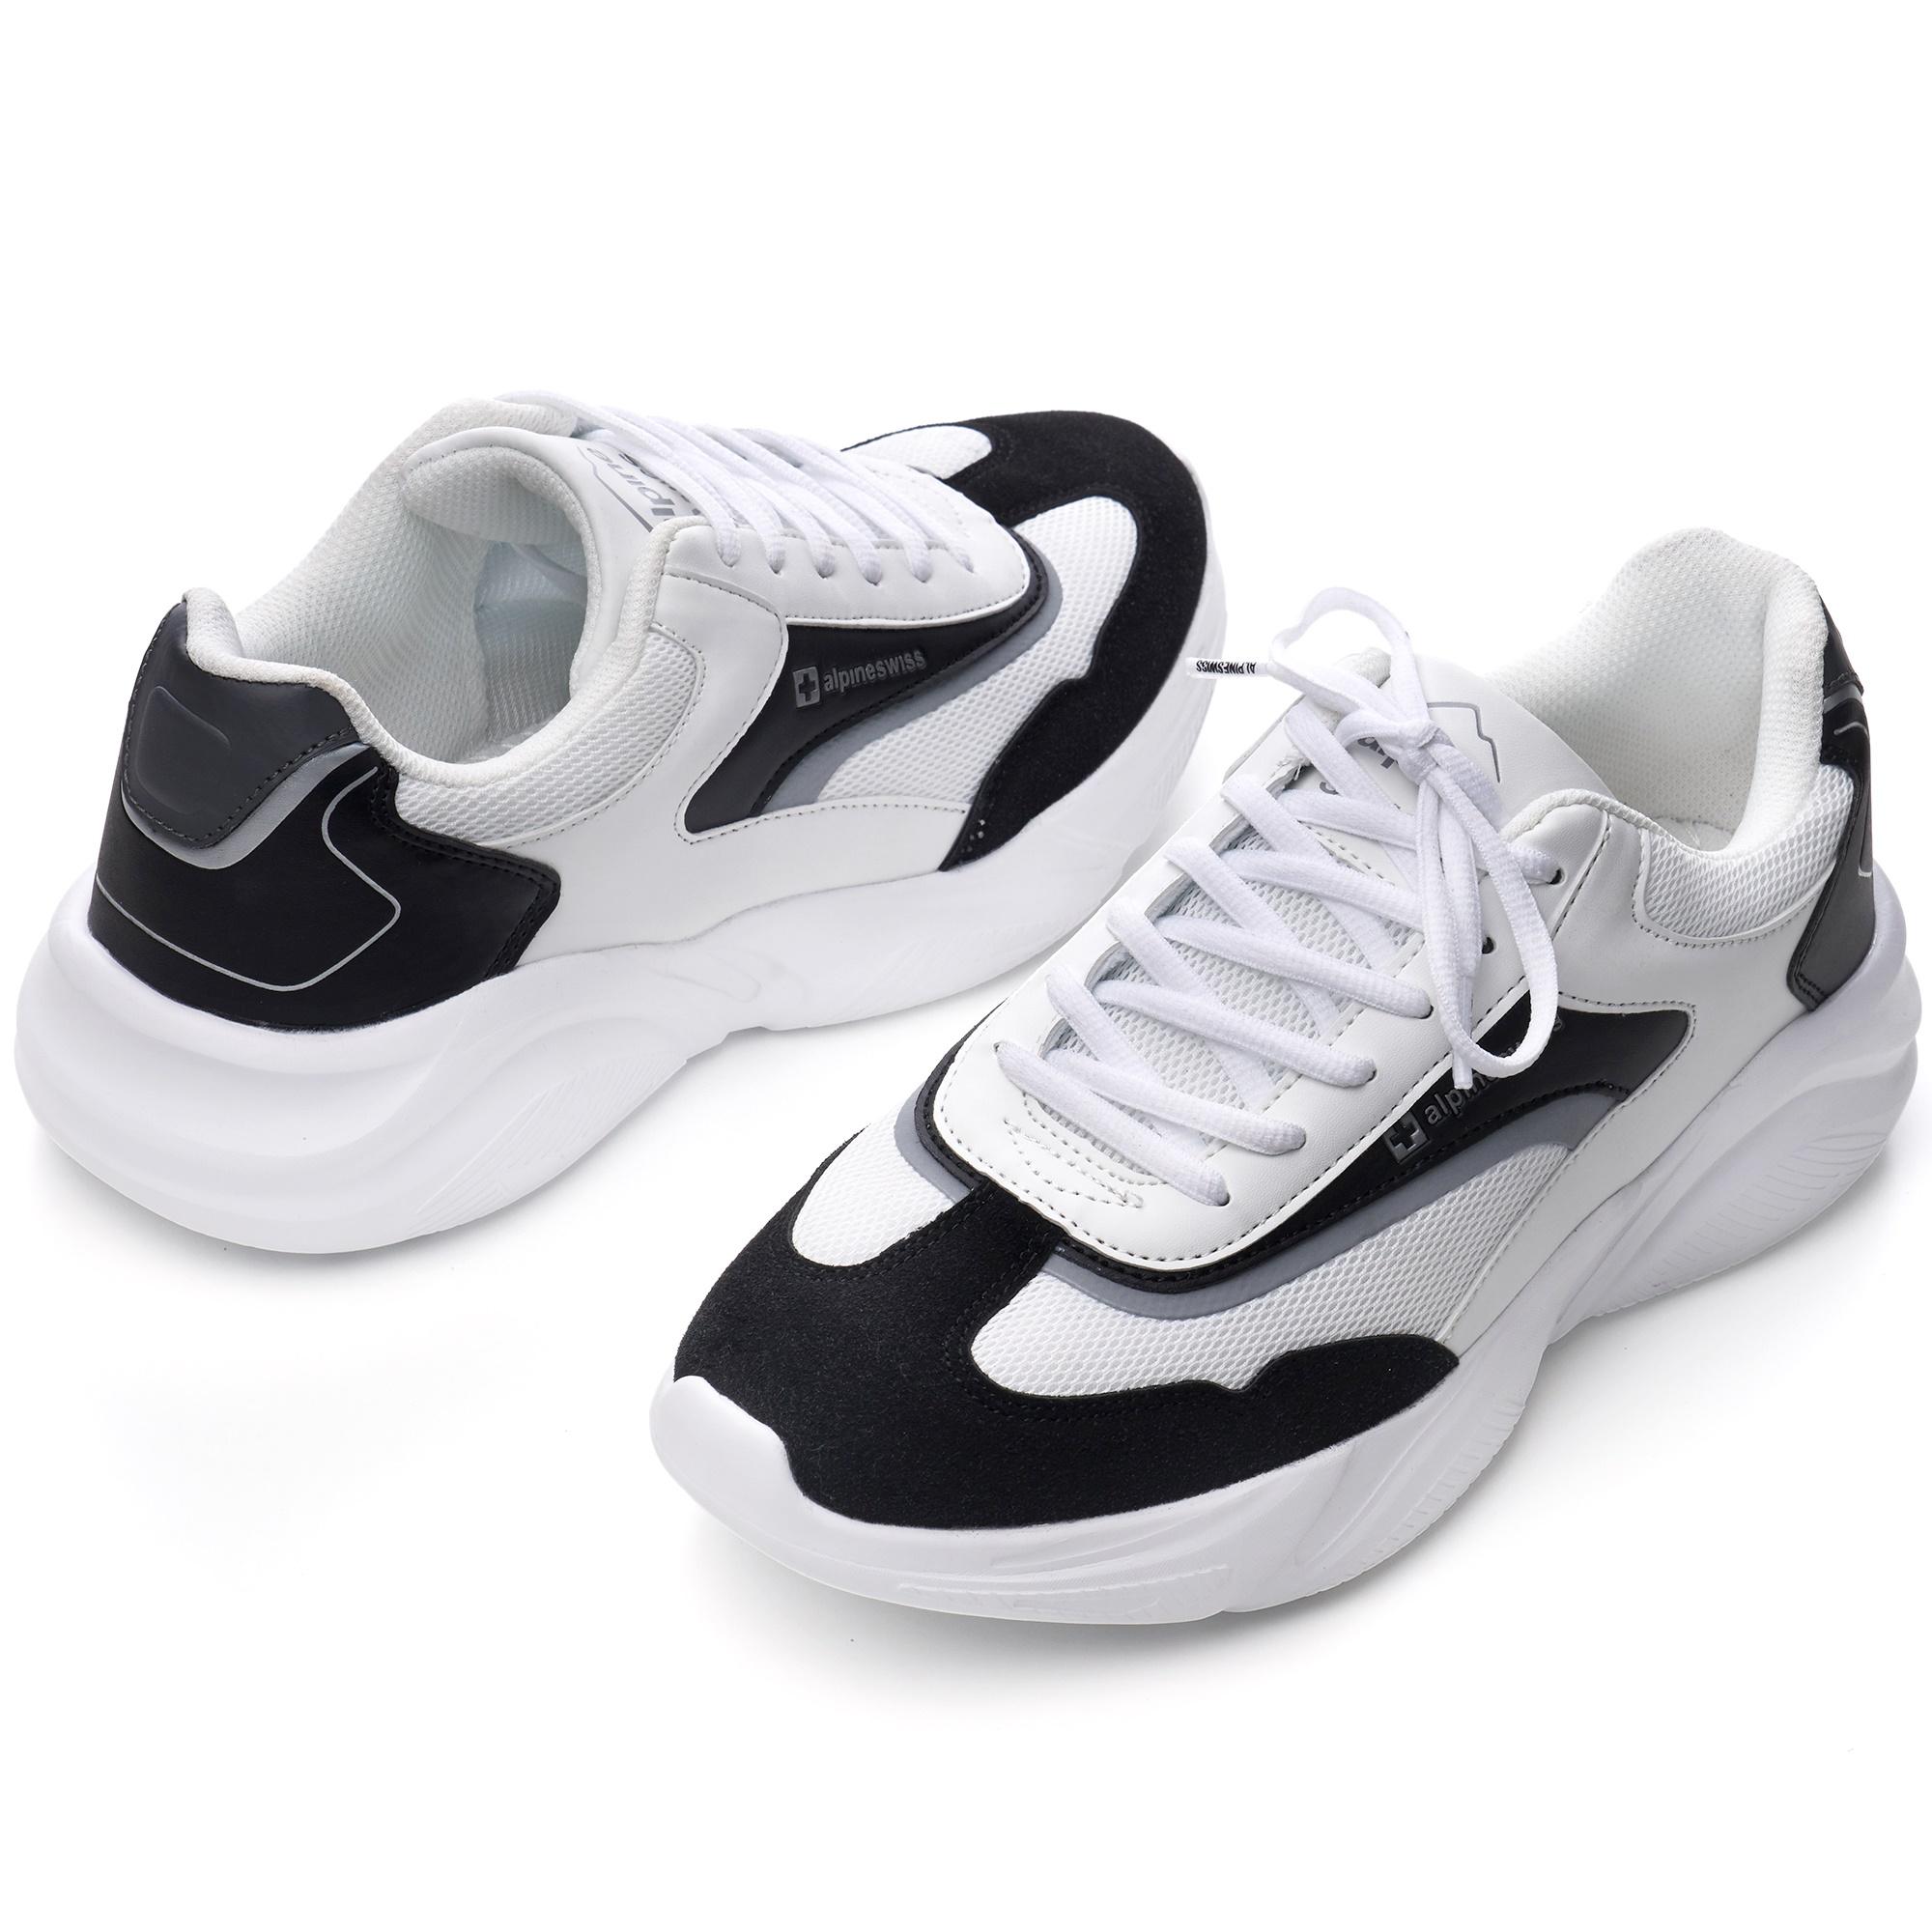 Alpine-Swiss-Stuart-Mens-Chunky-Sneakers-Retro-Platform-Dad-Tennis-Shoes thumbnail 27